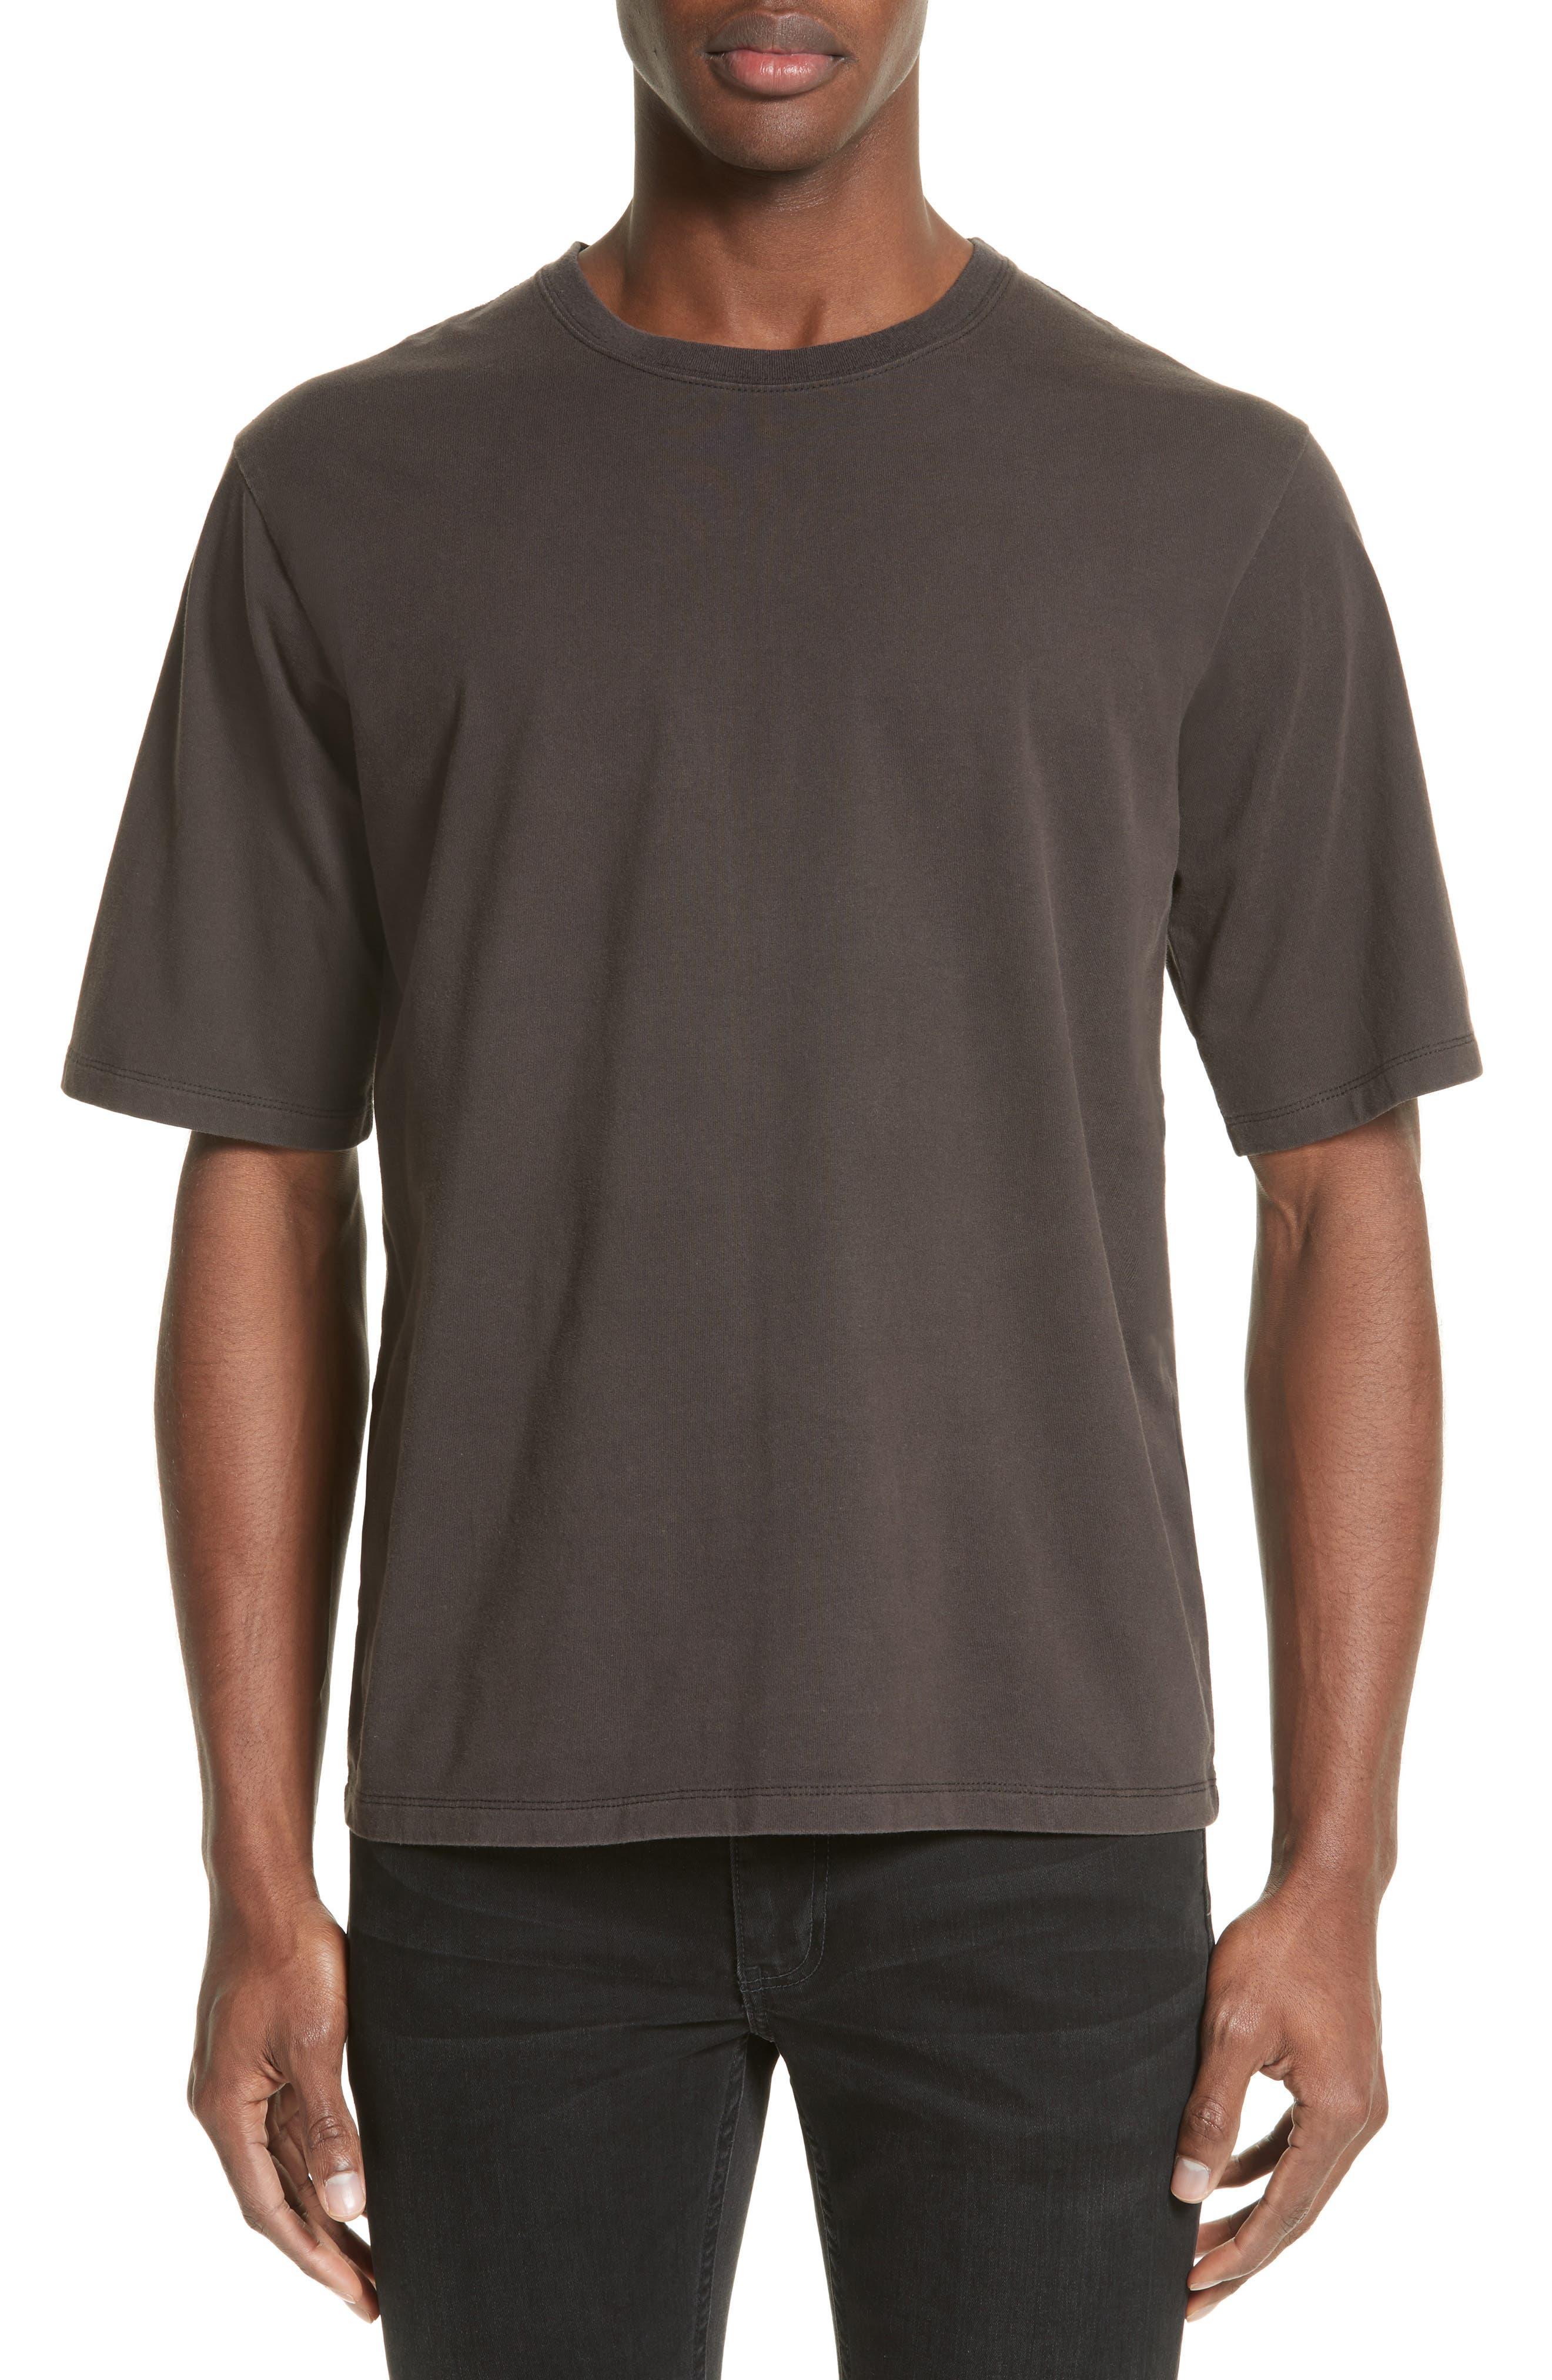 Main Image - OVADIA & SONS Type-01 T-Shirt